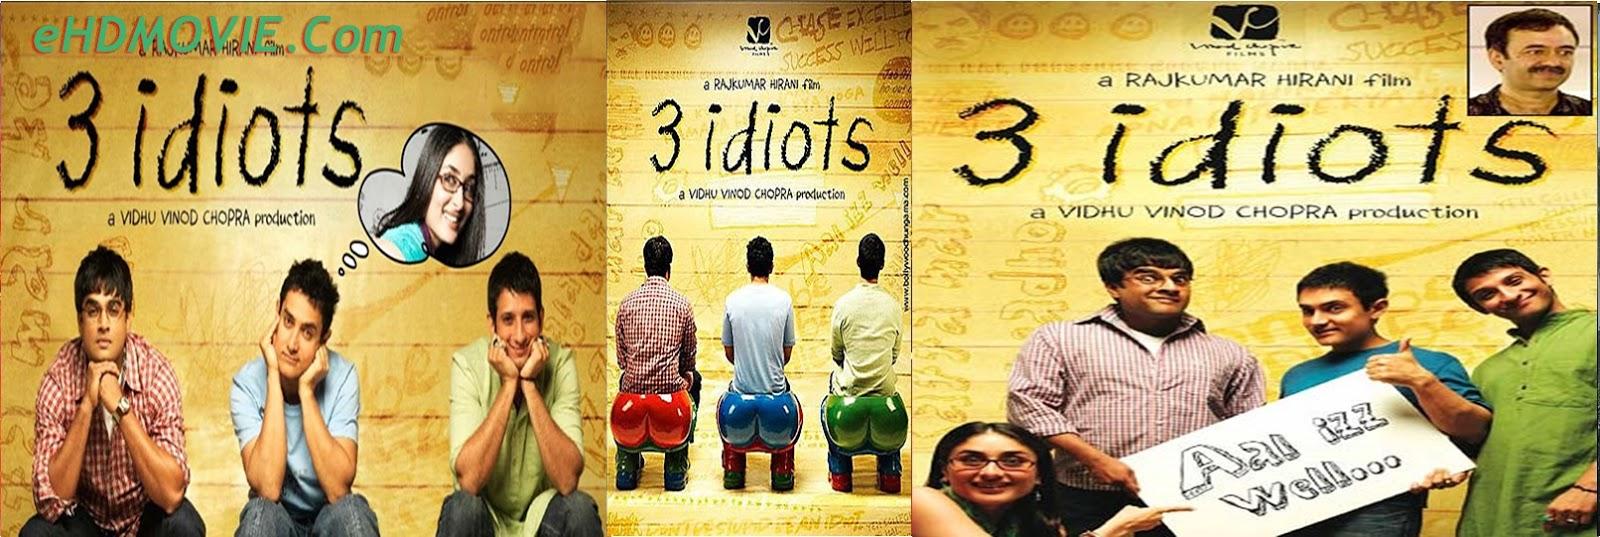 3 Idiots 2009 Full Movie Hindi 720p - HEVC – 480p ORG BRRip 500MB - 650MB - 1.3GB ESubs Free Download